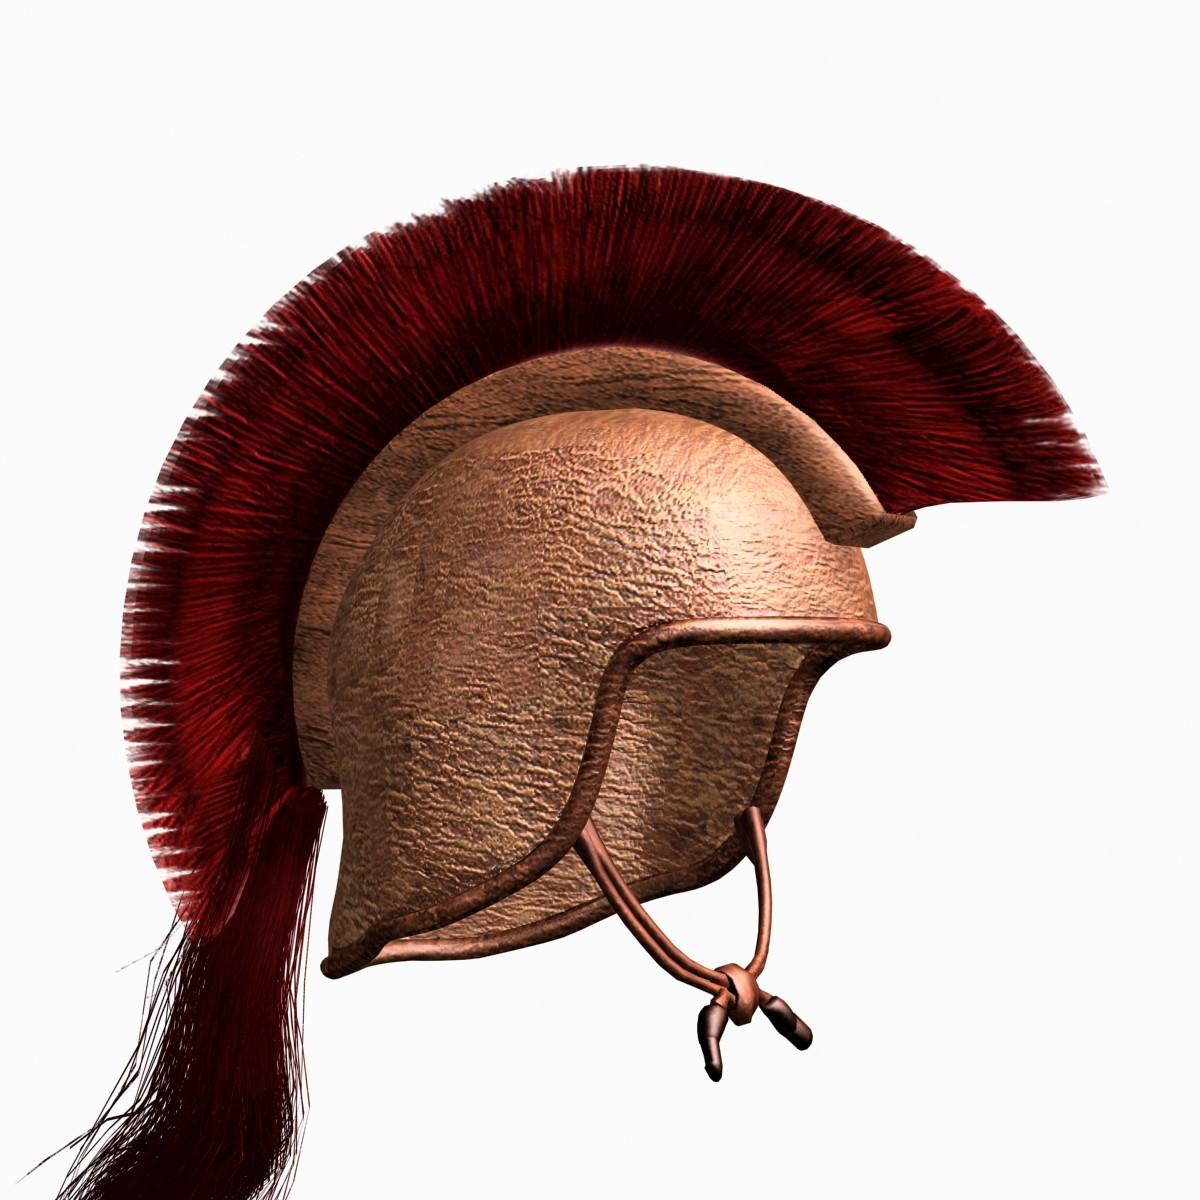 Helmet_HorsehairA00.jpg